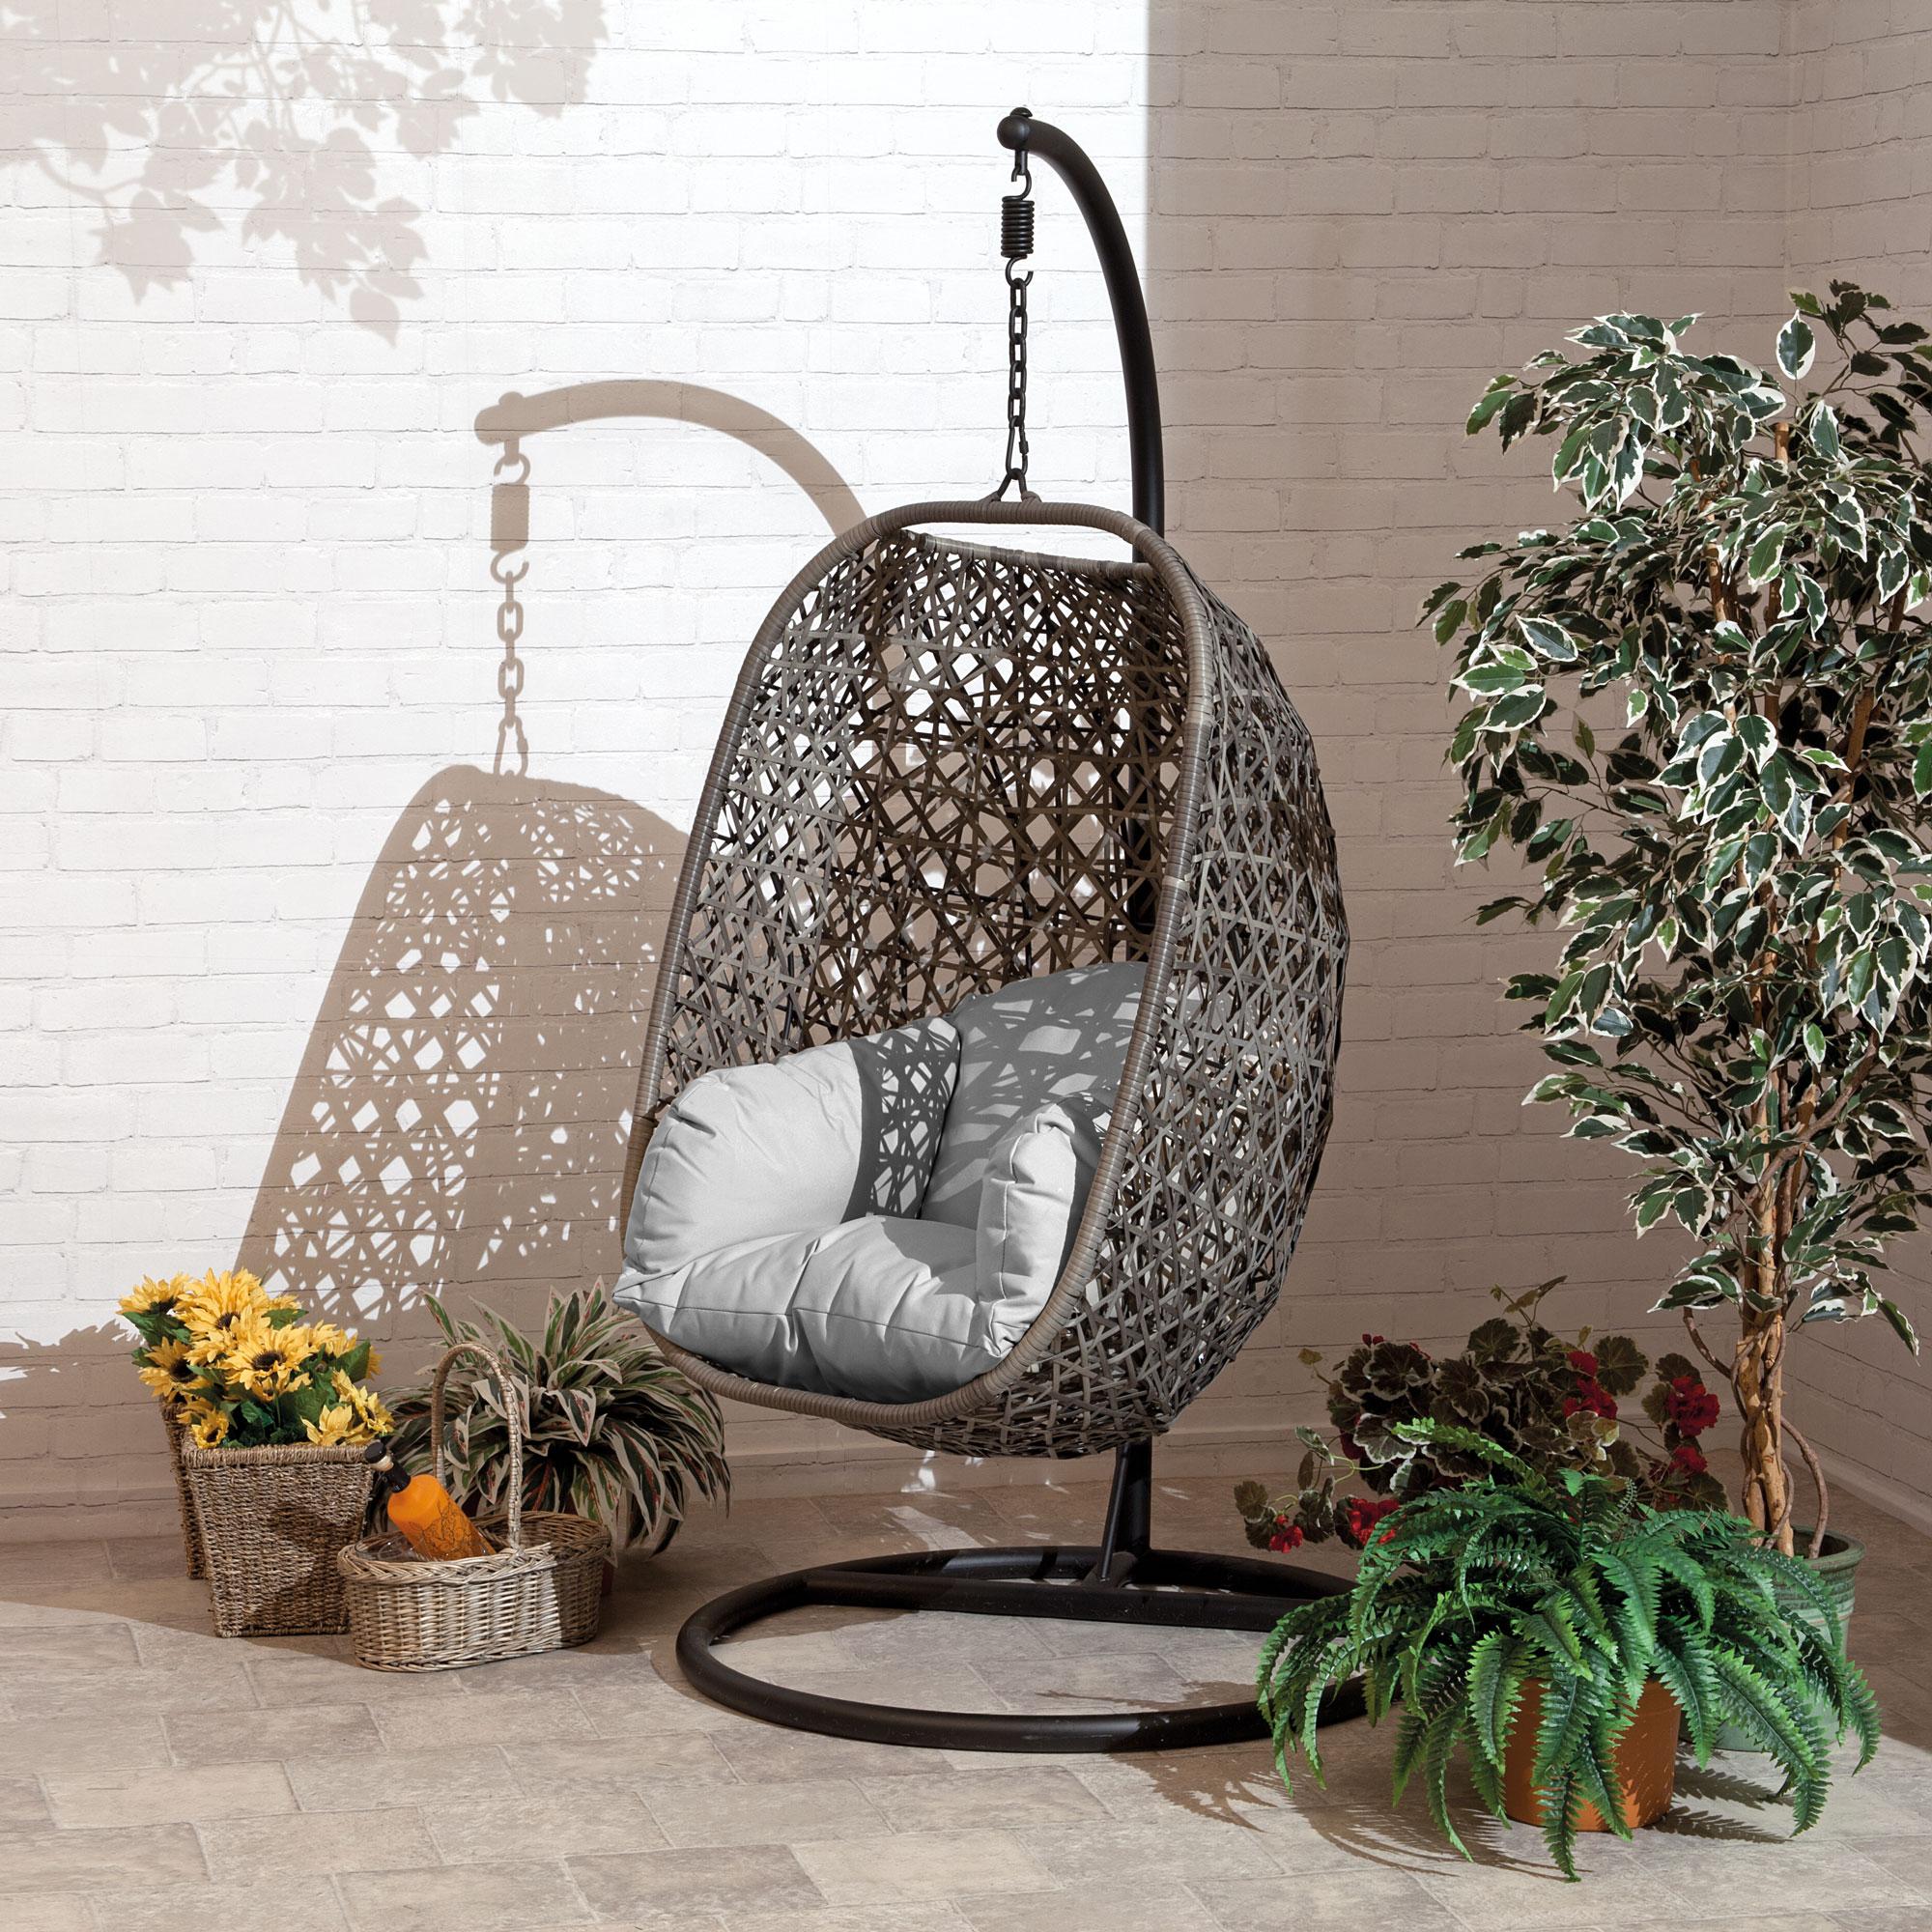 Brampton Luxury Rattan Wicker Outdoor Hanging Cocoon Egg Swing Chair with Grey Cushions (Single)